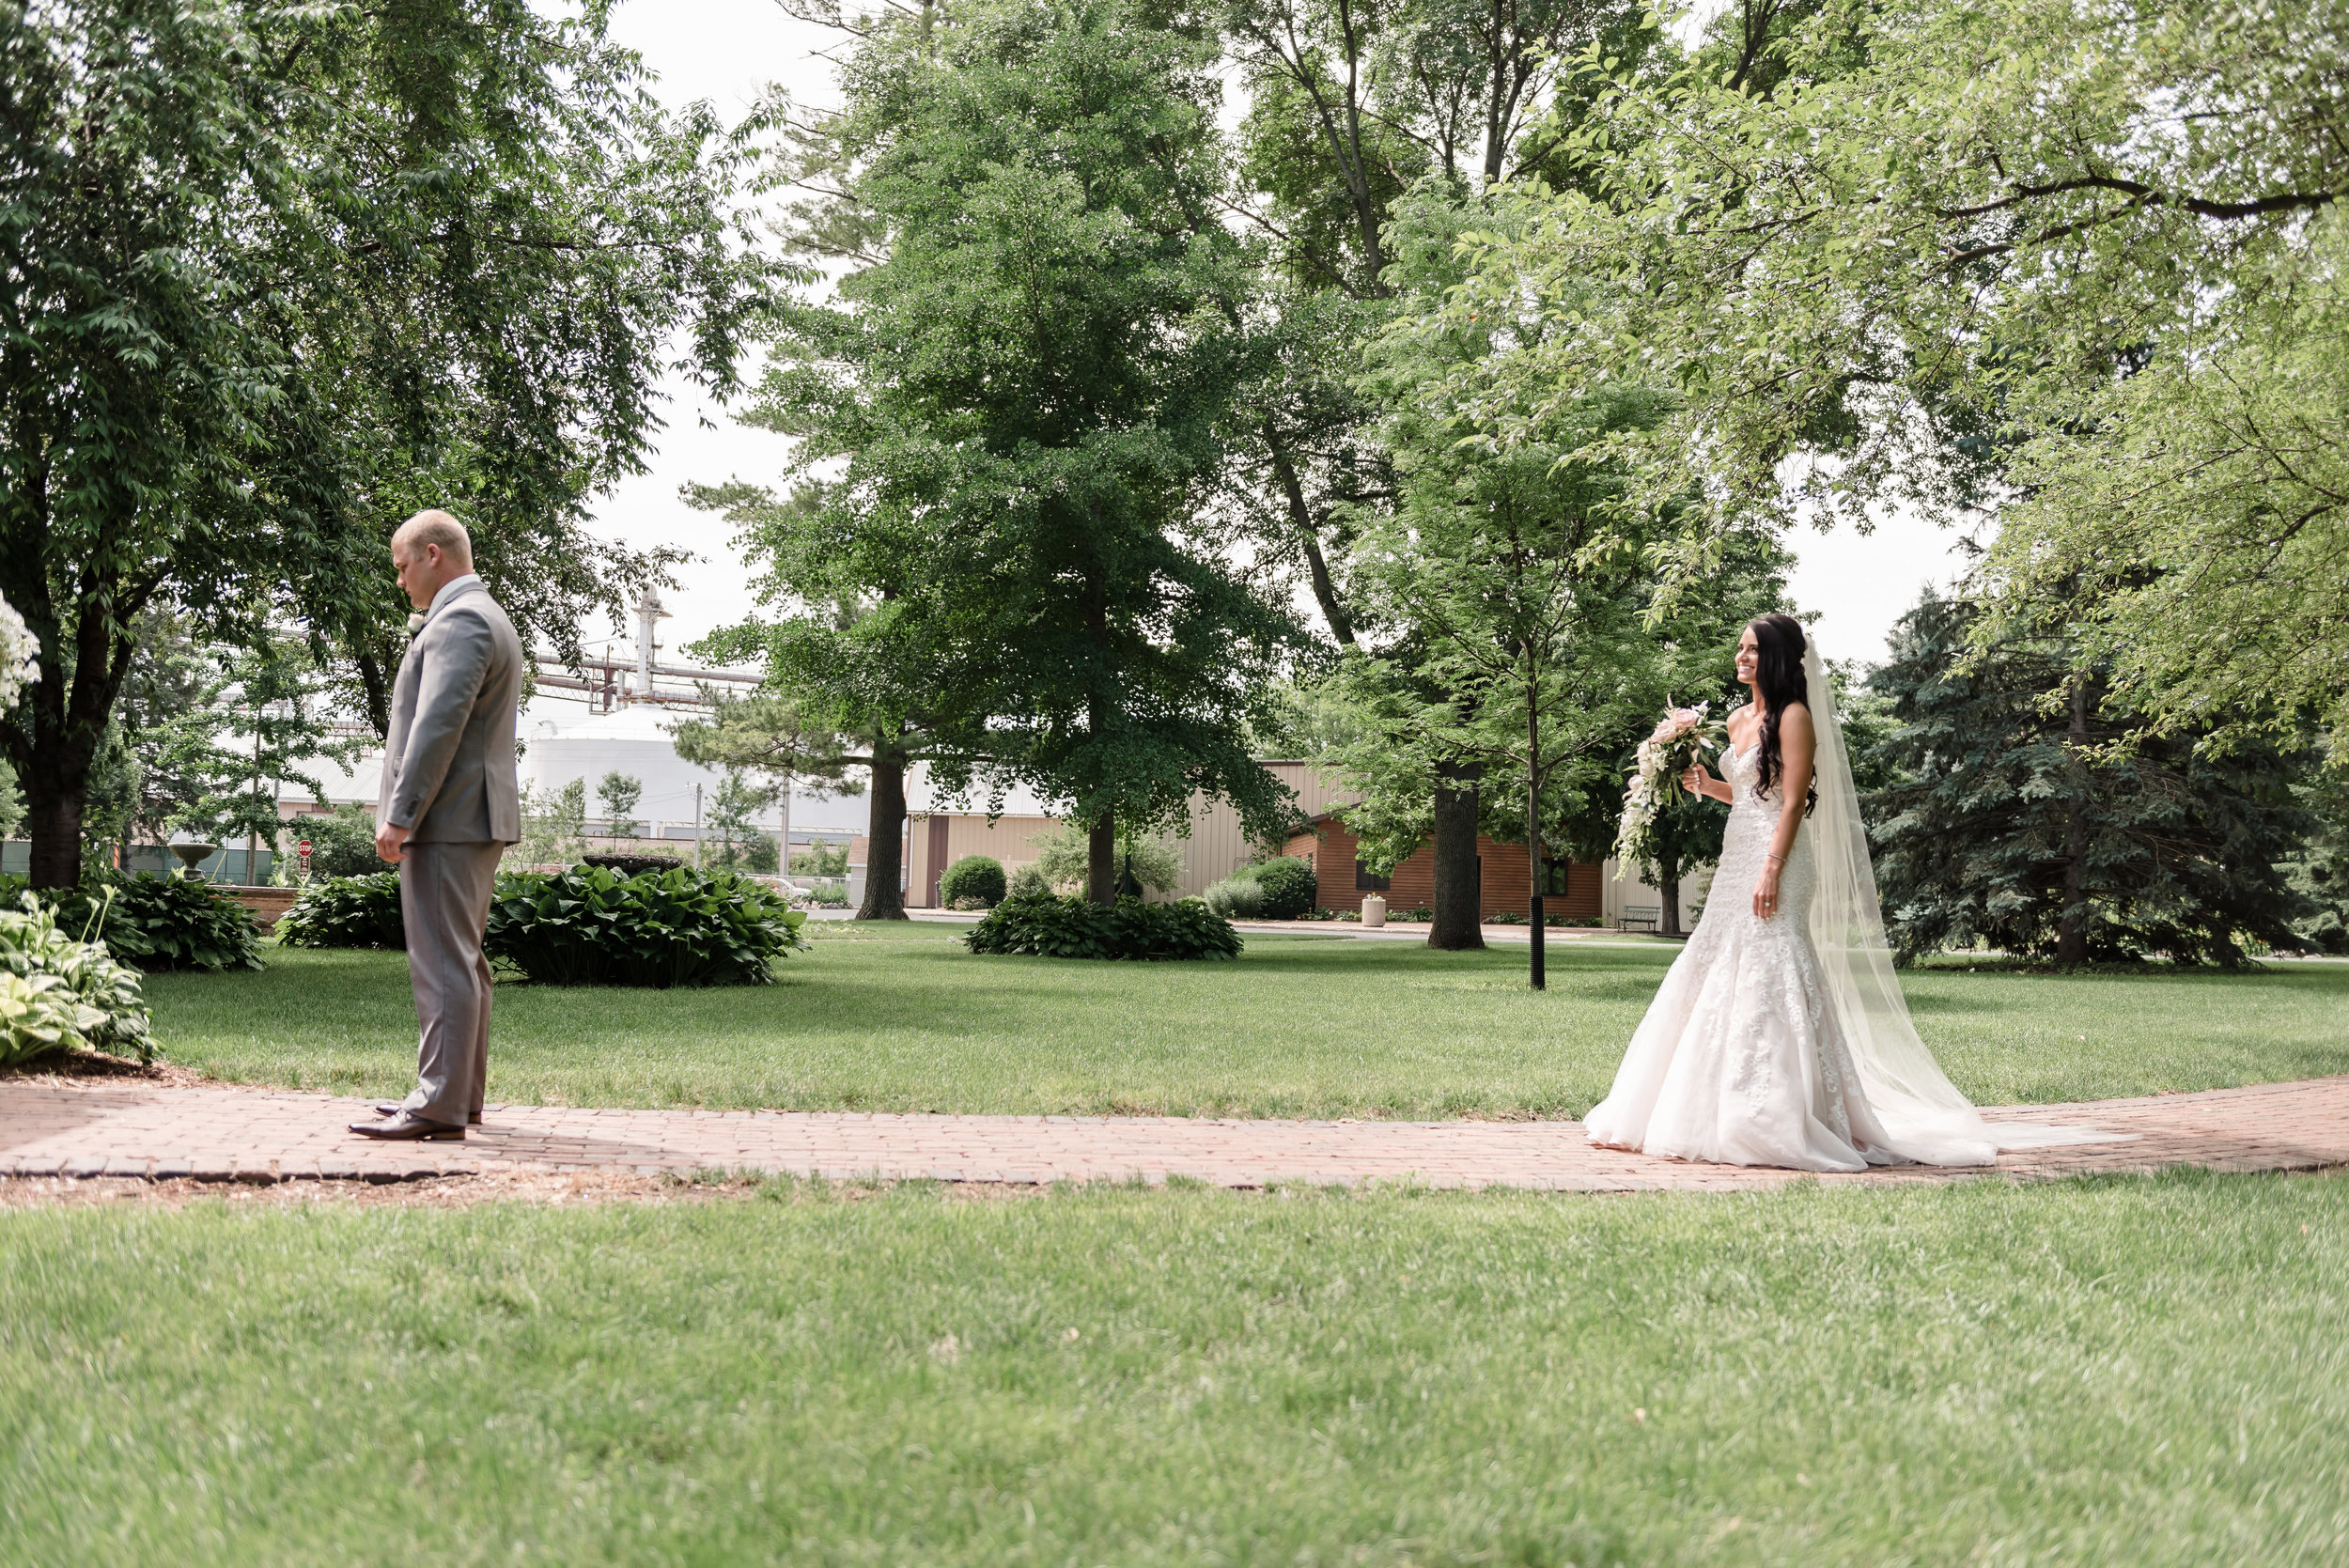 Layce and Brandon - Wedding - First Look-10.jpg